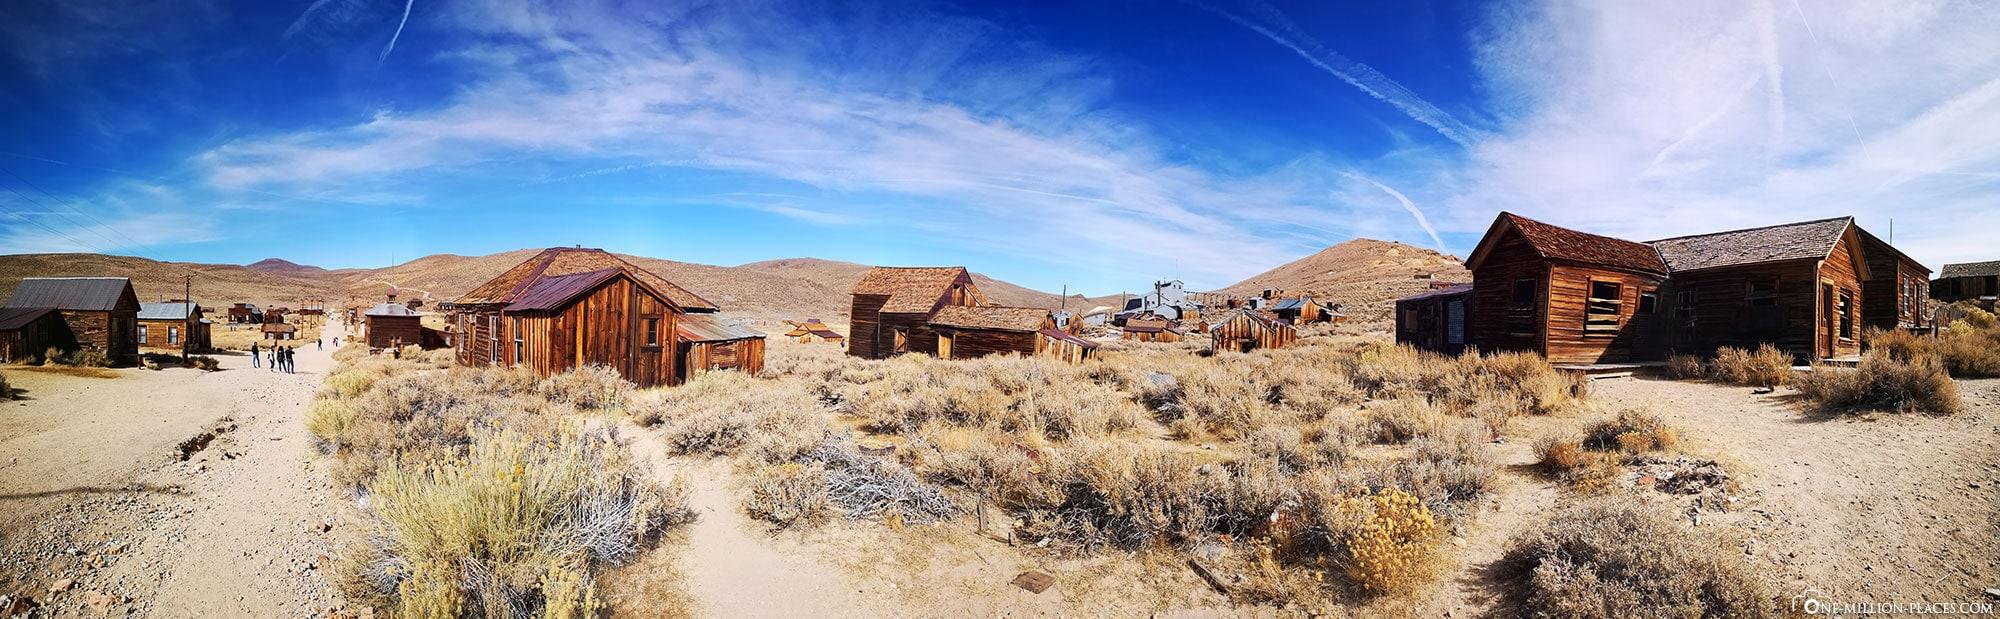 Panorama, Bodie, Ghost Town, Panorama, Geisterstadt, Kalifornien, USA